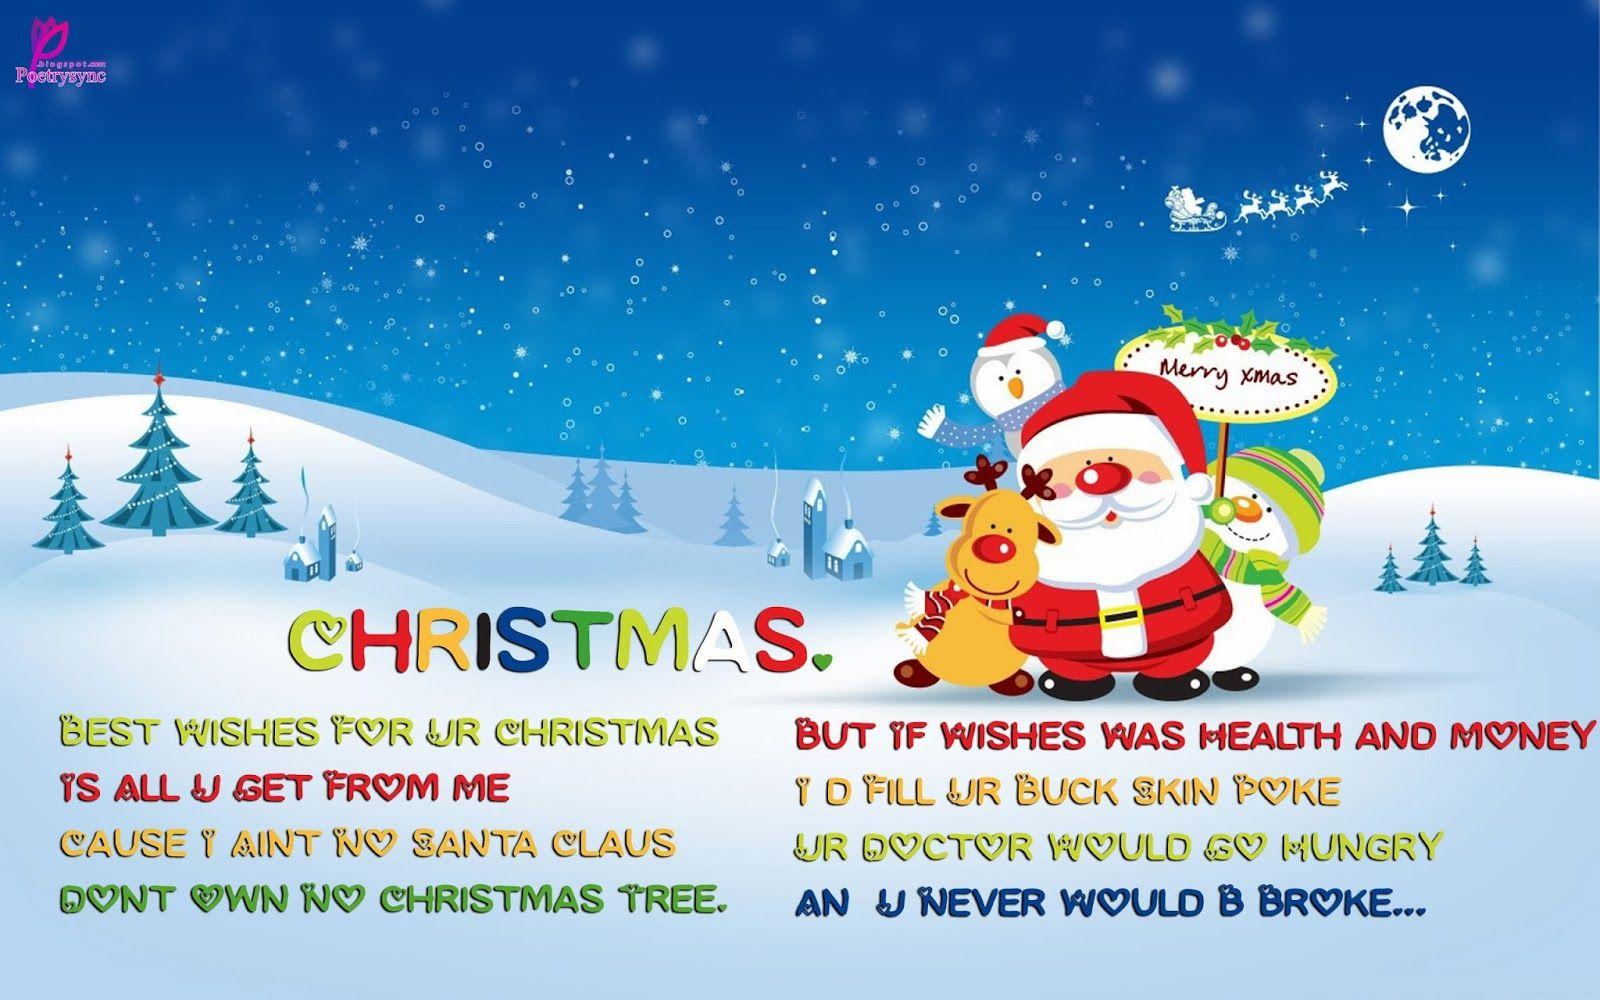 short christmas greetings messages – Sample Christmas Wish List